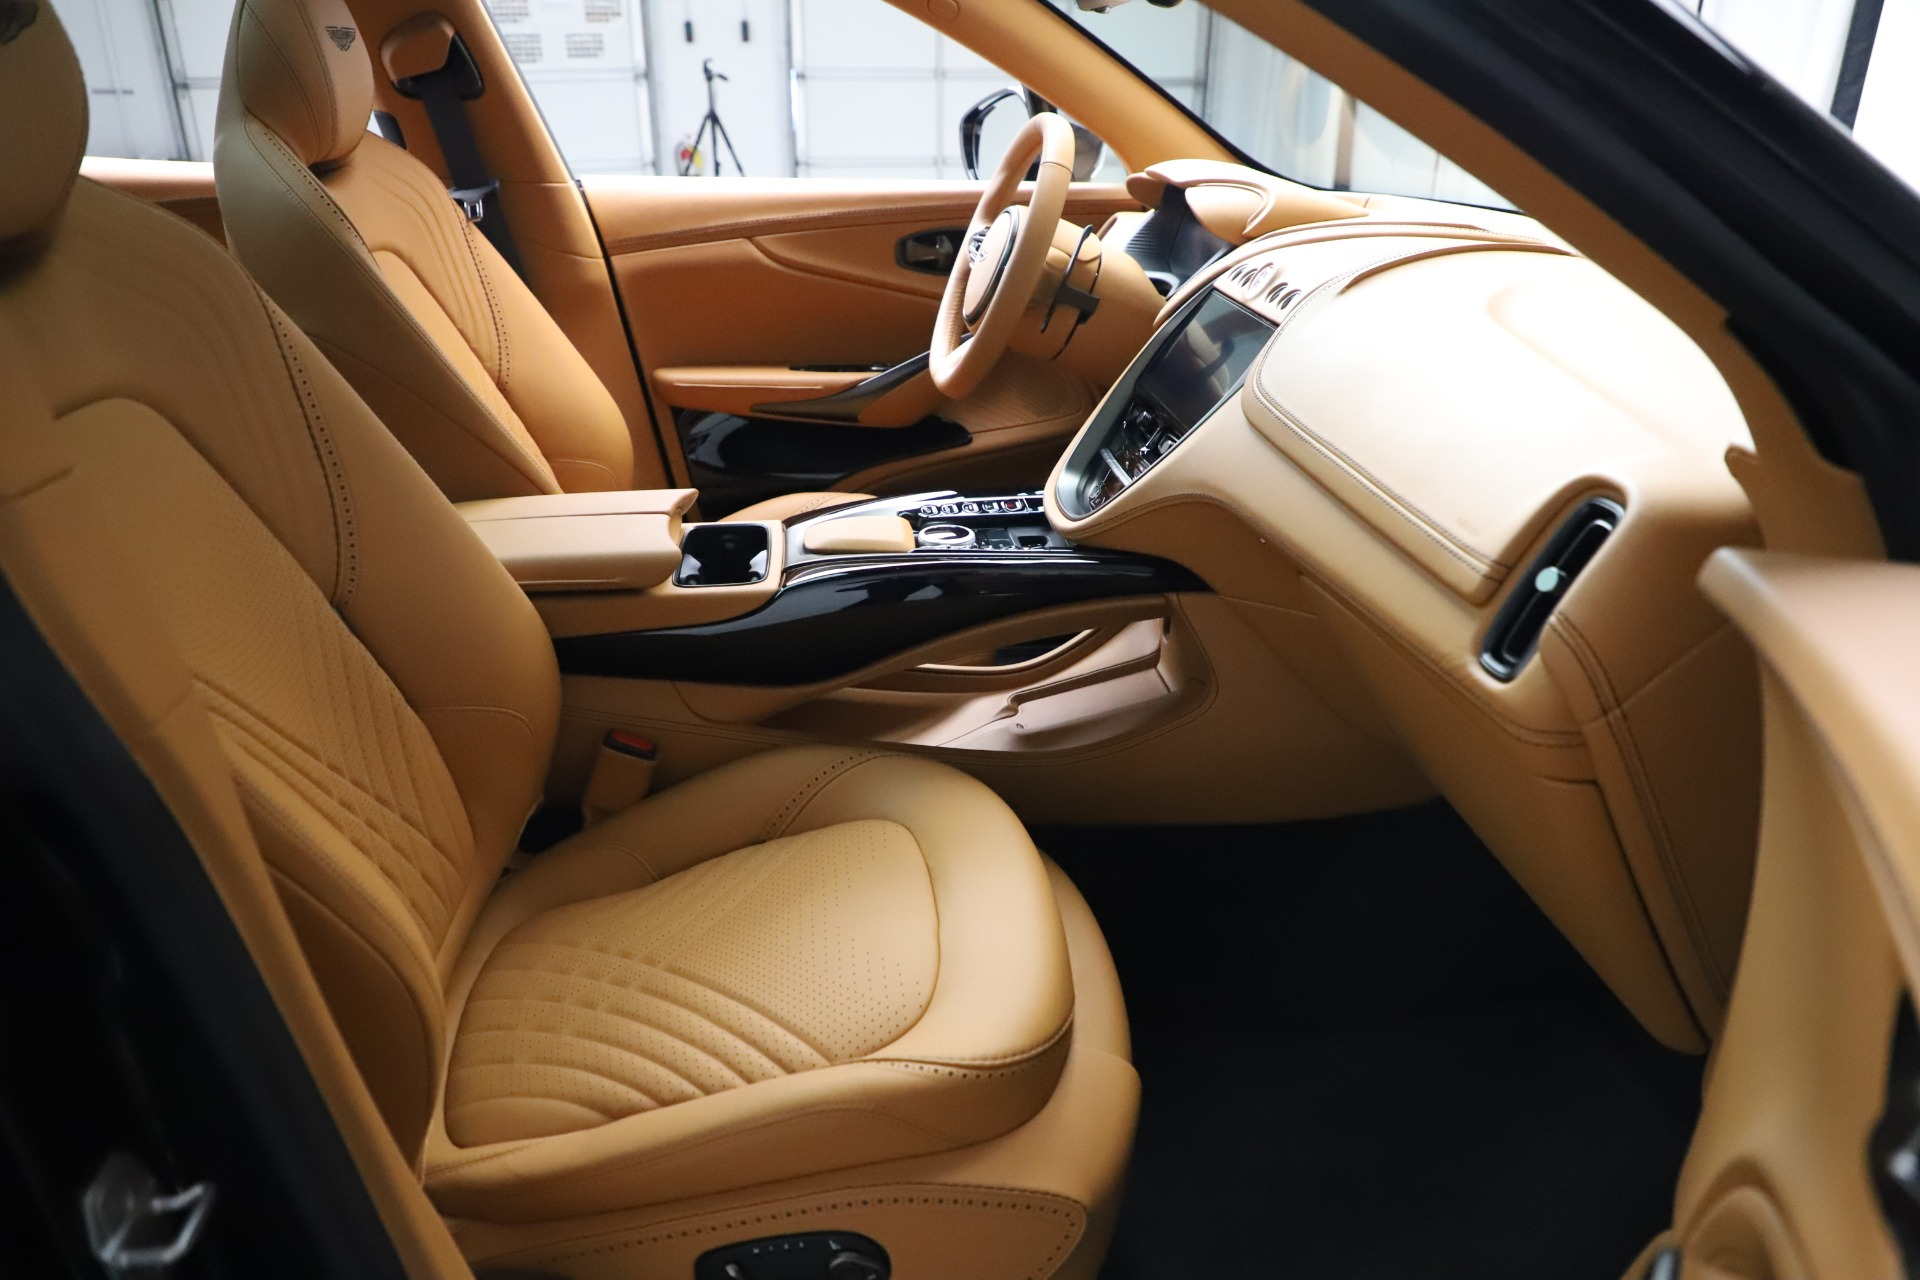 2019 Aston Martin Db11 Volante Stock Now Taking Orders For Sale